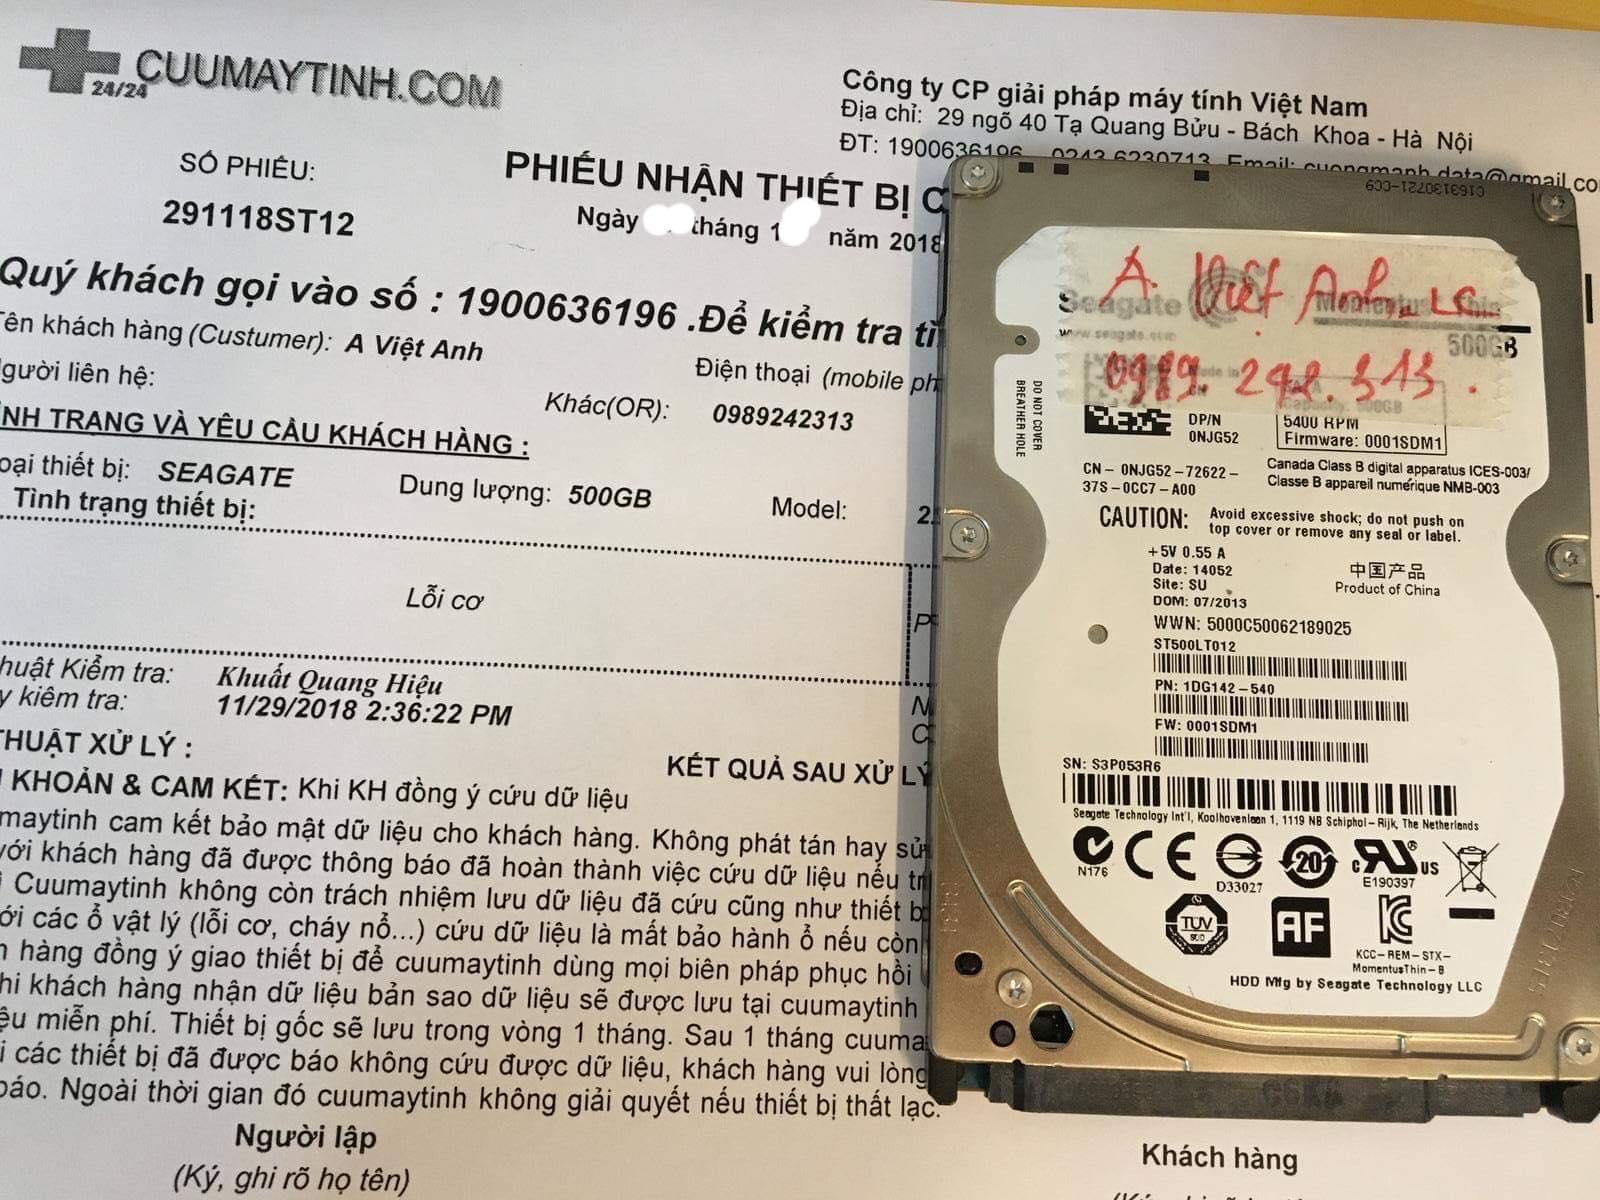 Lấy lại dữ liệu ổ cứng Seagate 500GB lỗi cơ - cuumaytinh